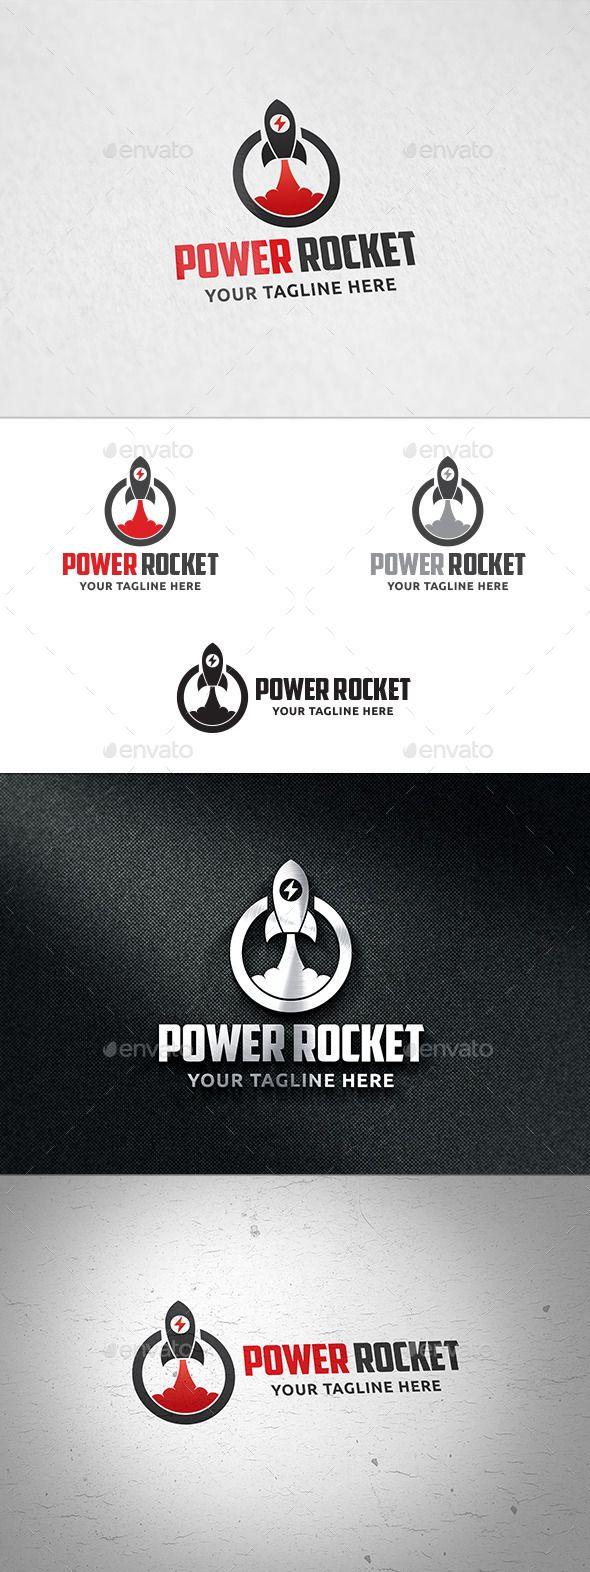 Power Rocket  Logo Templates — Vector EPS #explore #web rocket • Available here → https://graphicriver.net/item/power-rocket-logo-templates/12376119?ref=pxcr